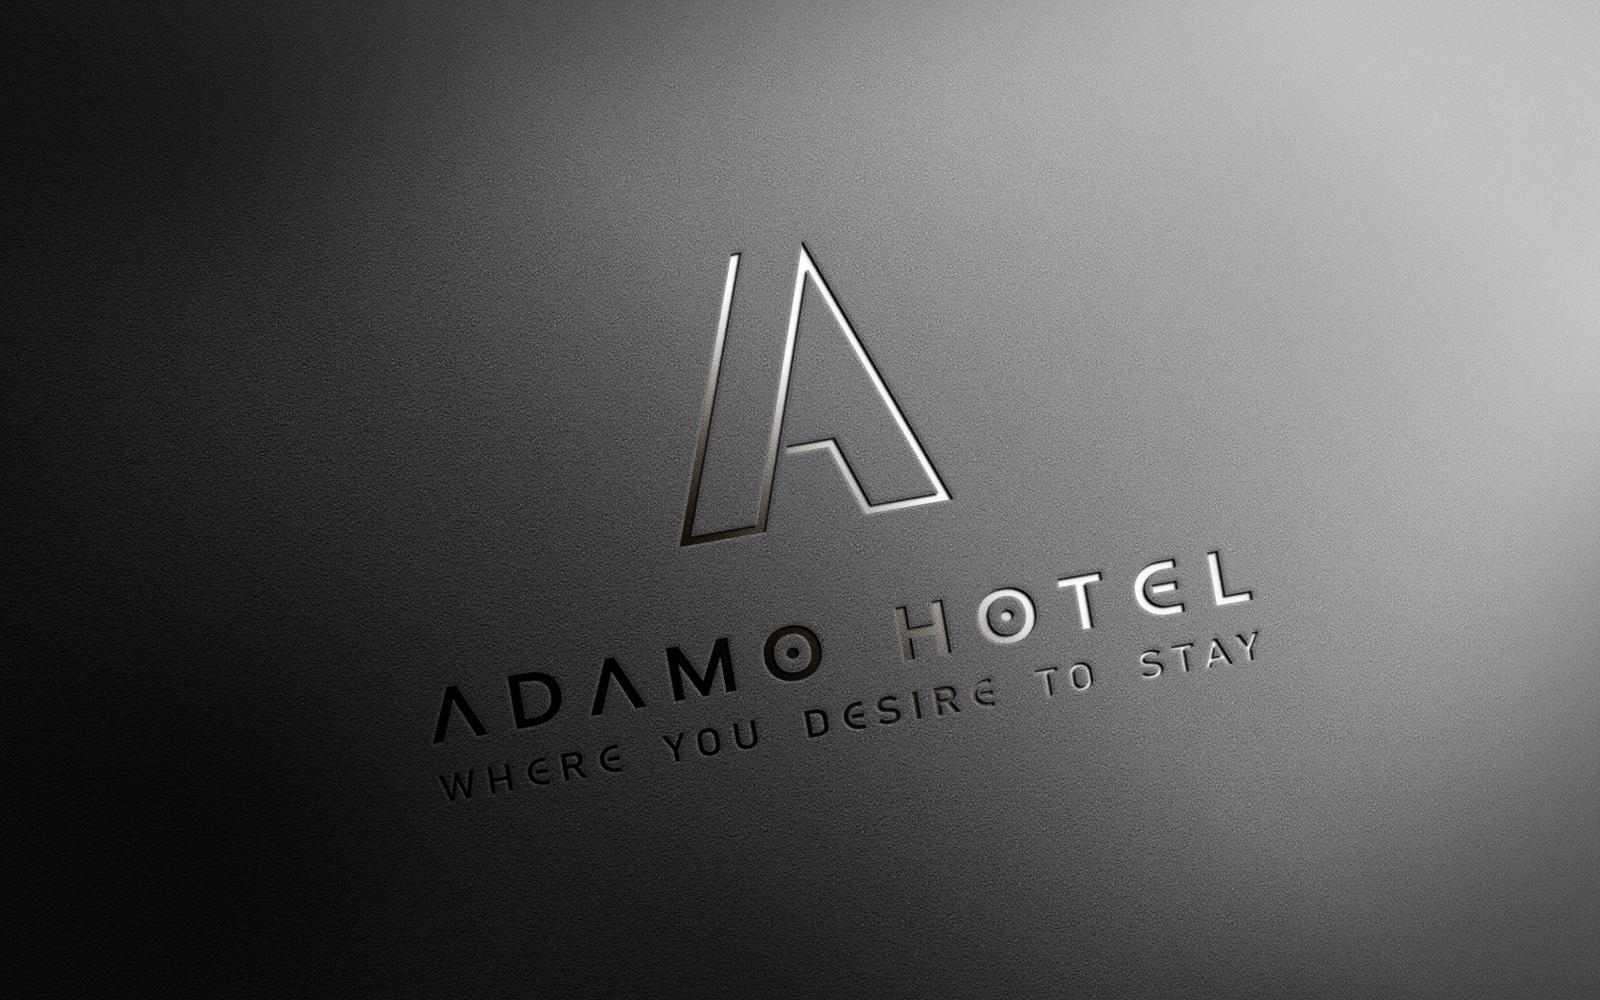 Hotel Adamo ლოგოს დიზაინი ლოგოს დამზადება, ლოგოს დიზაინი, ლოგოების შექმნა, ლოგოების დამზადება, ლოგოს დამზადების ფასი,  ბრენდინგი, ბანერების დამზადება, ლოგოტიპის შექმნა, ლოგოტიპების დიზაინი, ოპტიმიზაცია, facebook დიზაინი, ვებგვერდის დიზაინი, ლოგოების დიზაინი, ლოგოტიპების დამზადება, saitebis damzadena, logoebis damzadeba, saitis damzadeba, logos damzadeba,